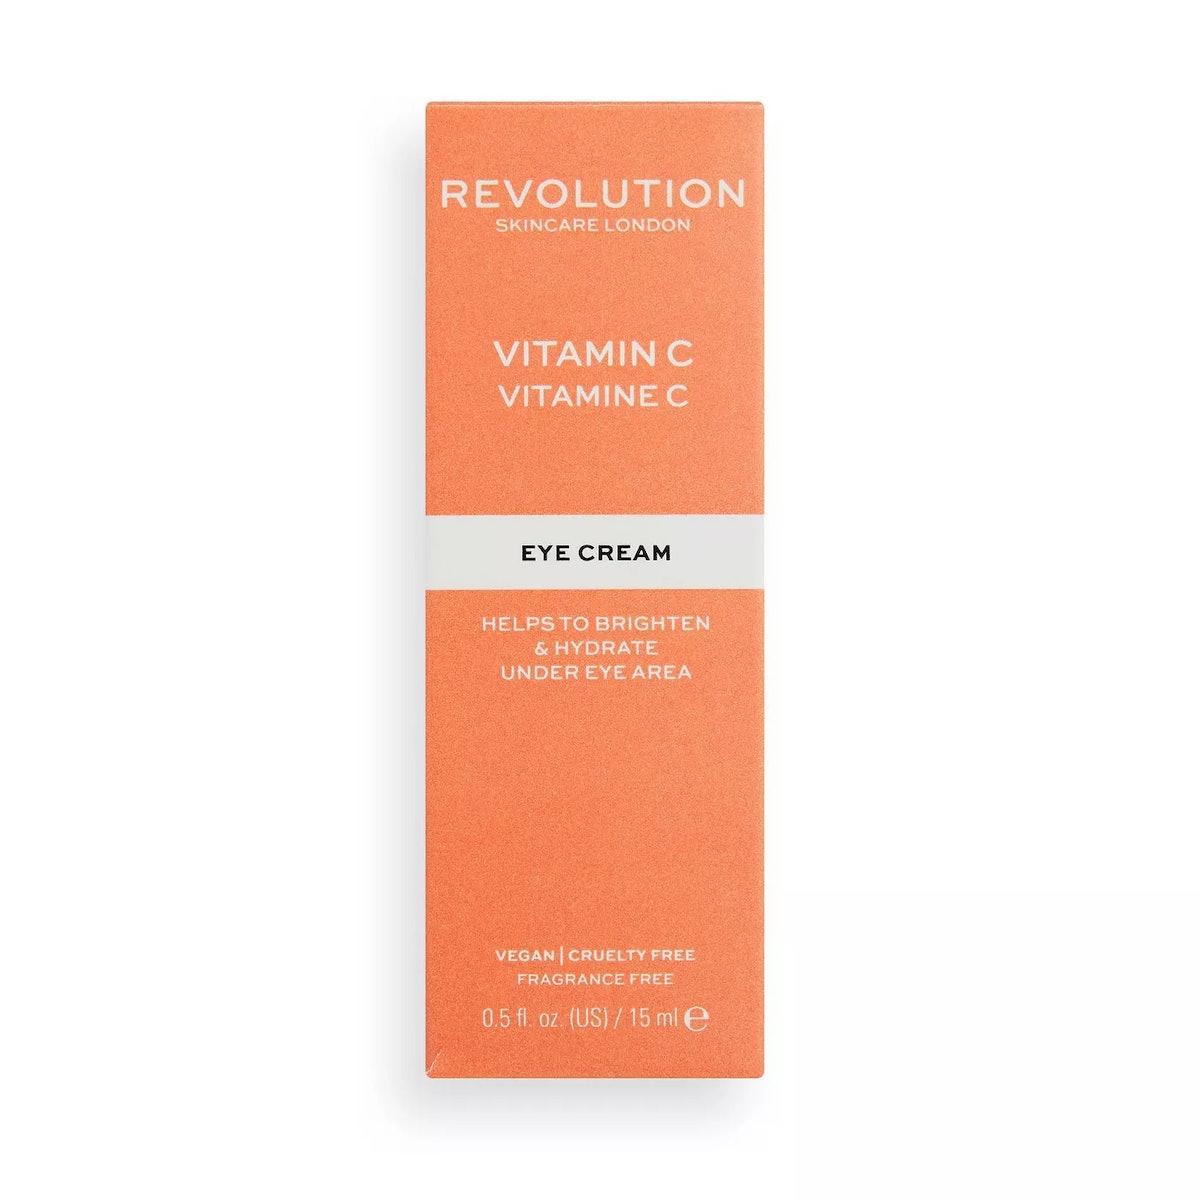 Makeup Revolution Skincare Vitamin C Eye Cream